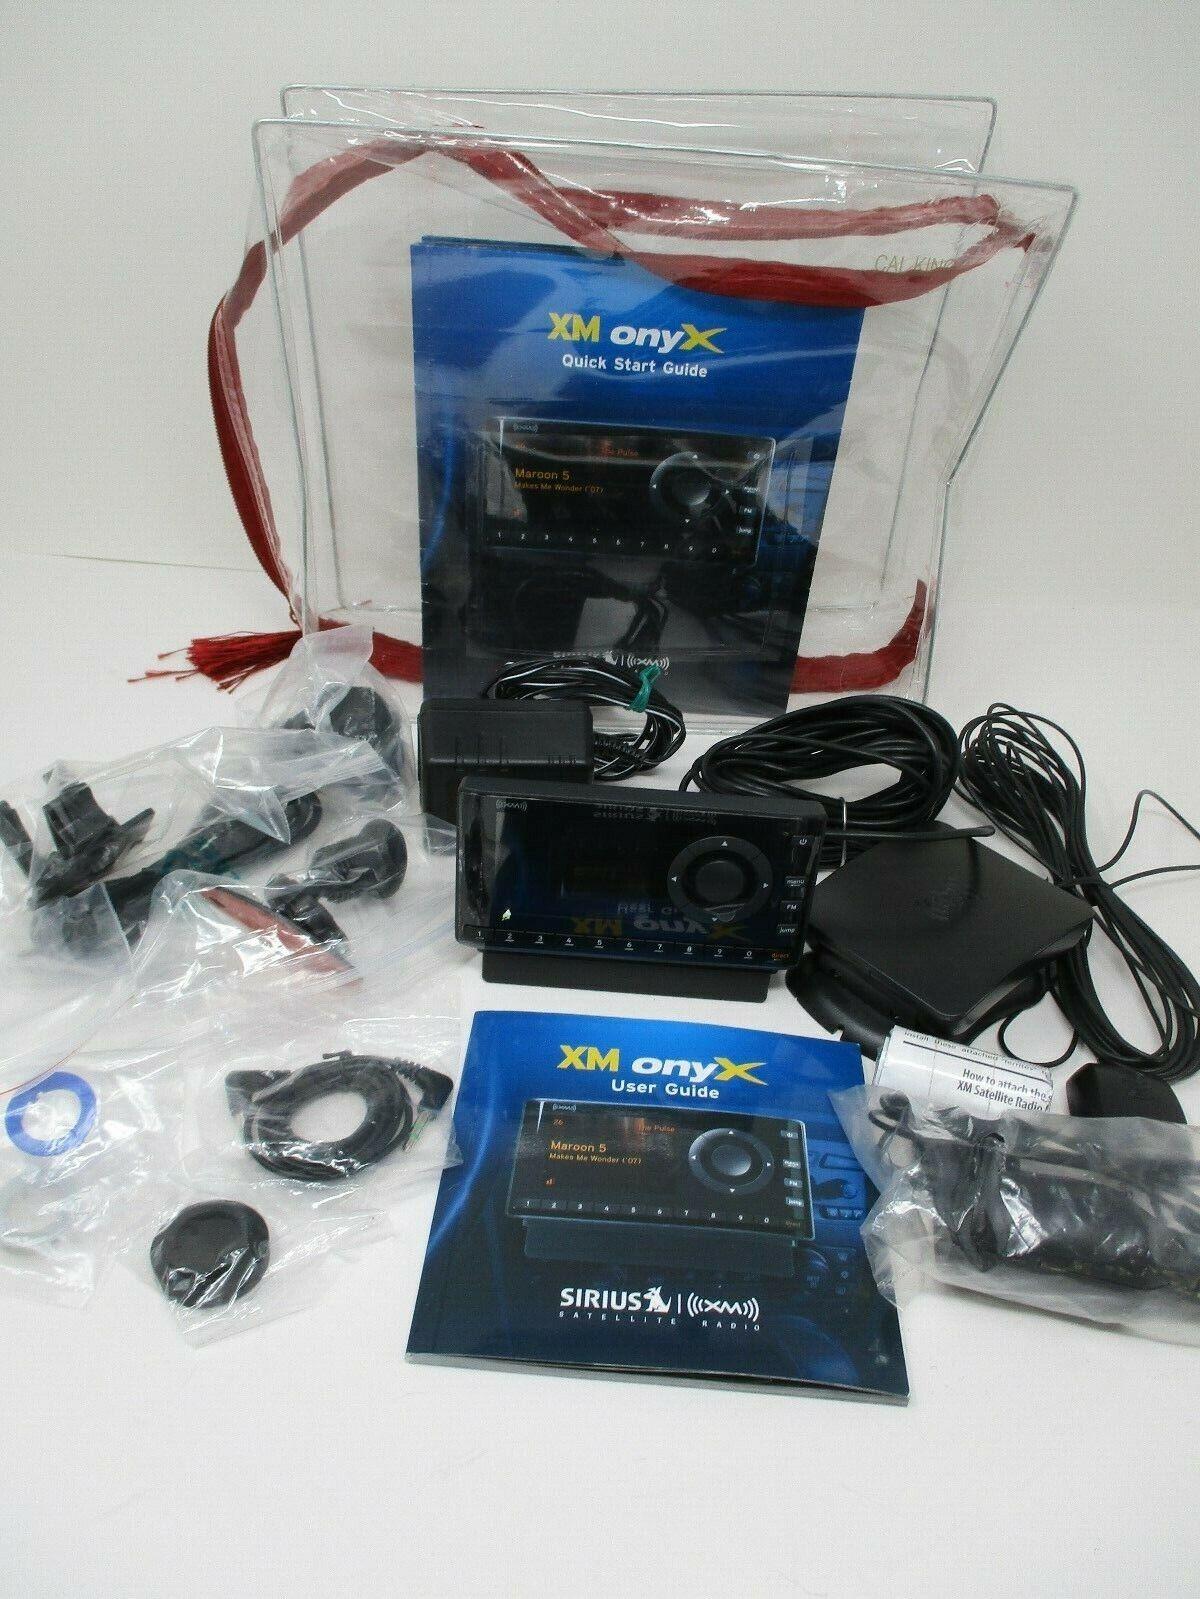 XM Onyx Sirius Satellite Car Radio XDNX1 Full Kit~ Never Used